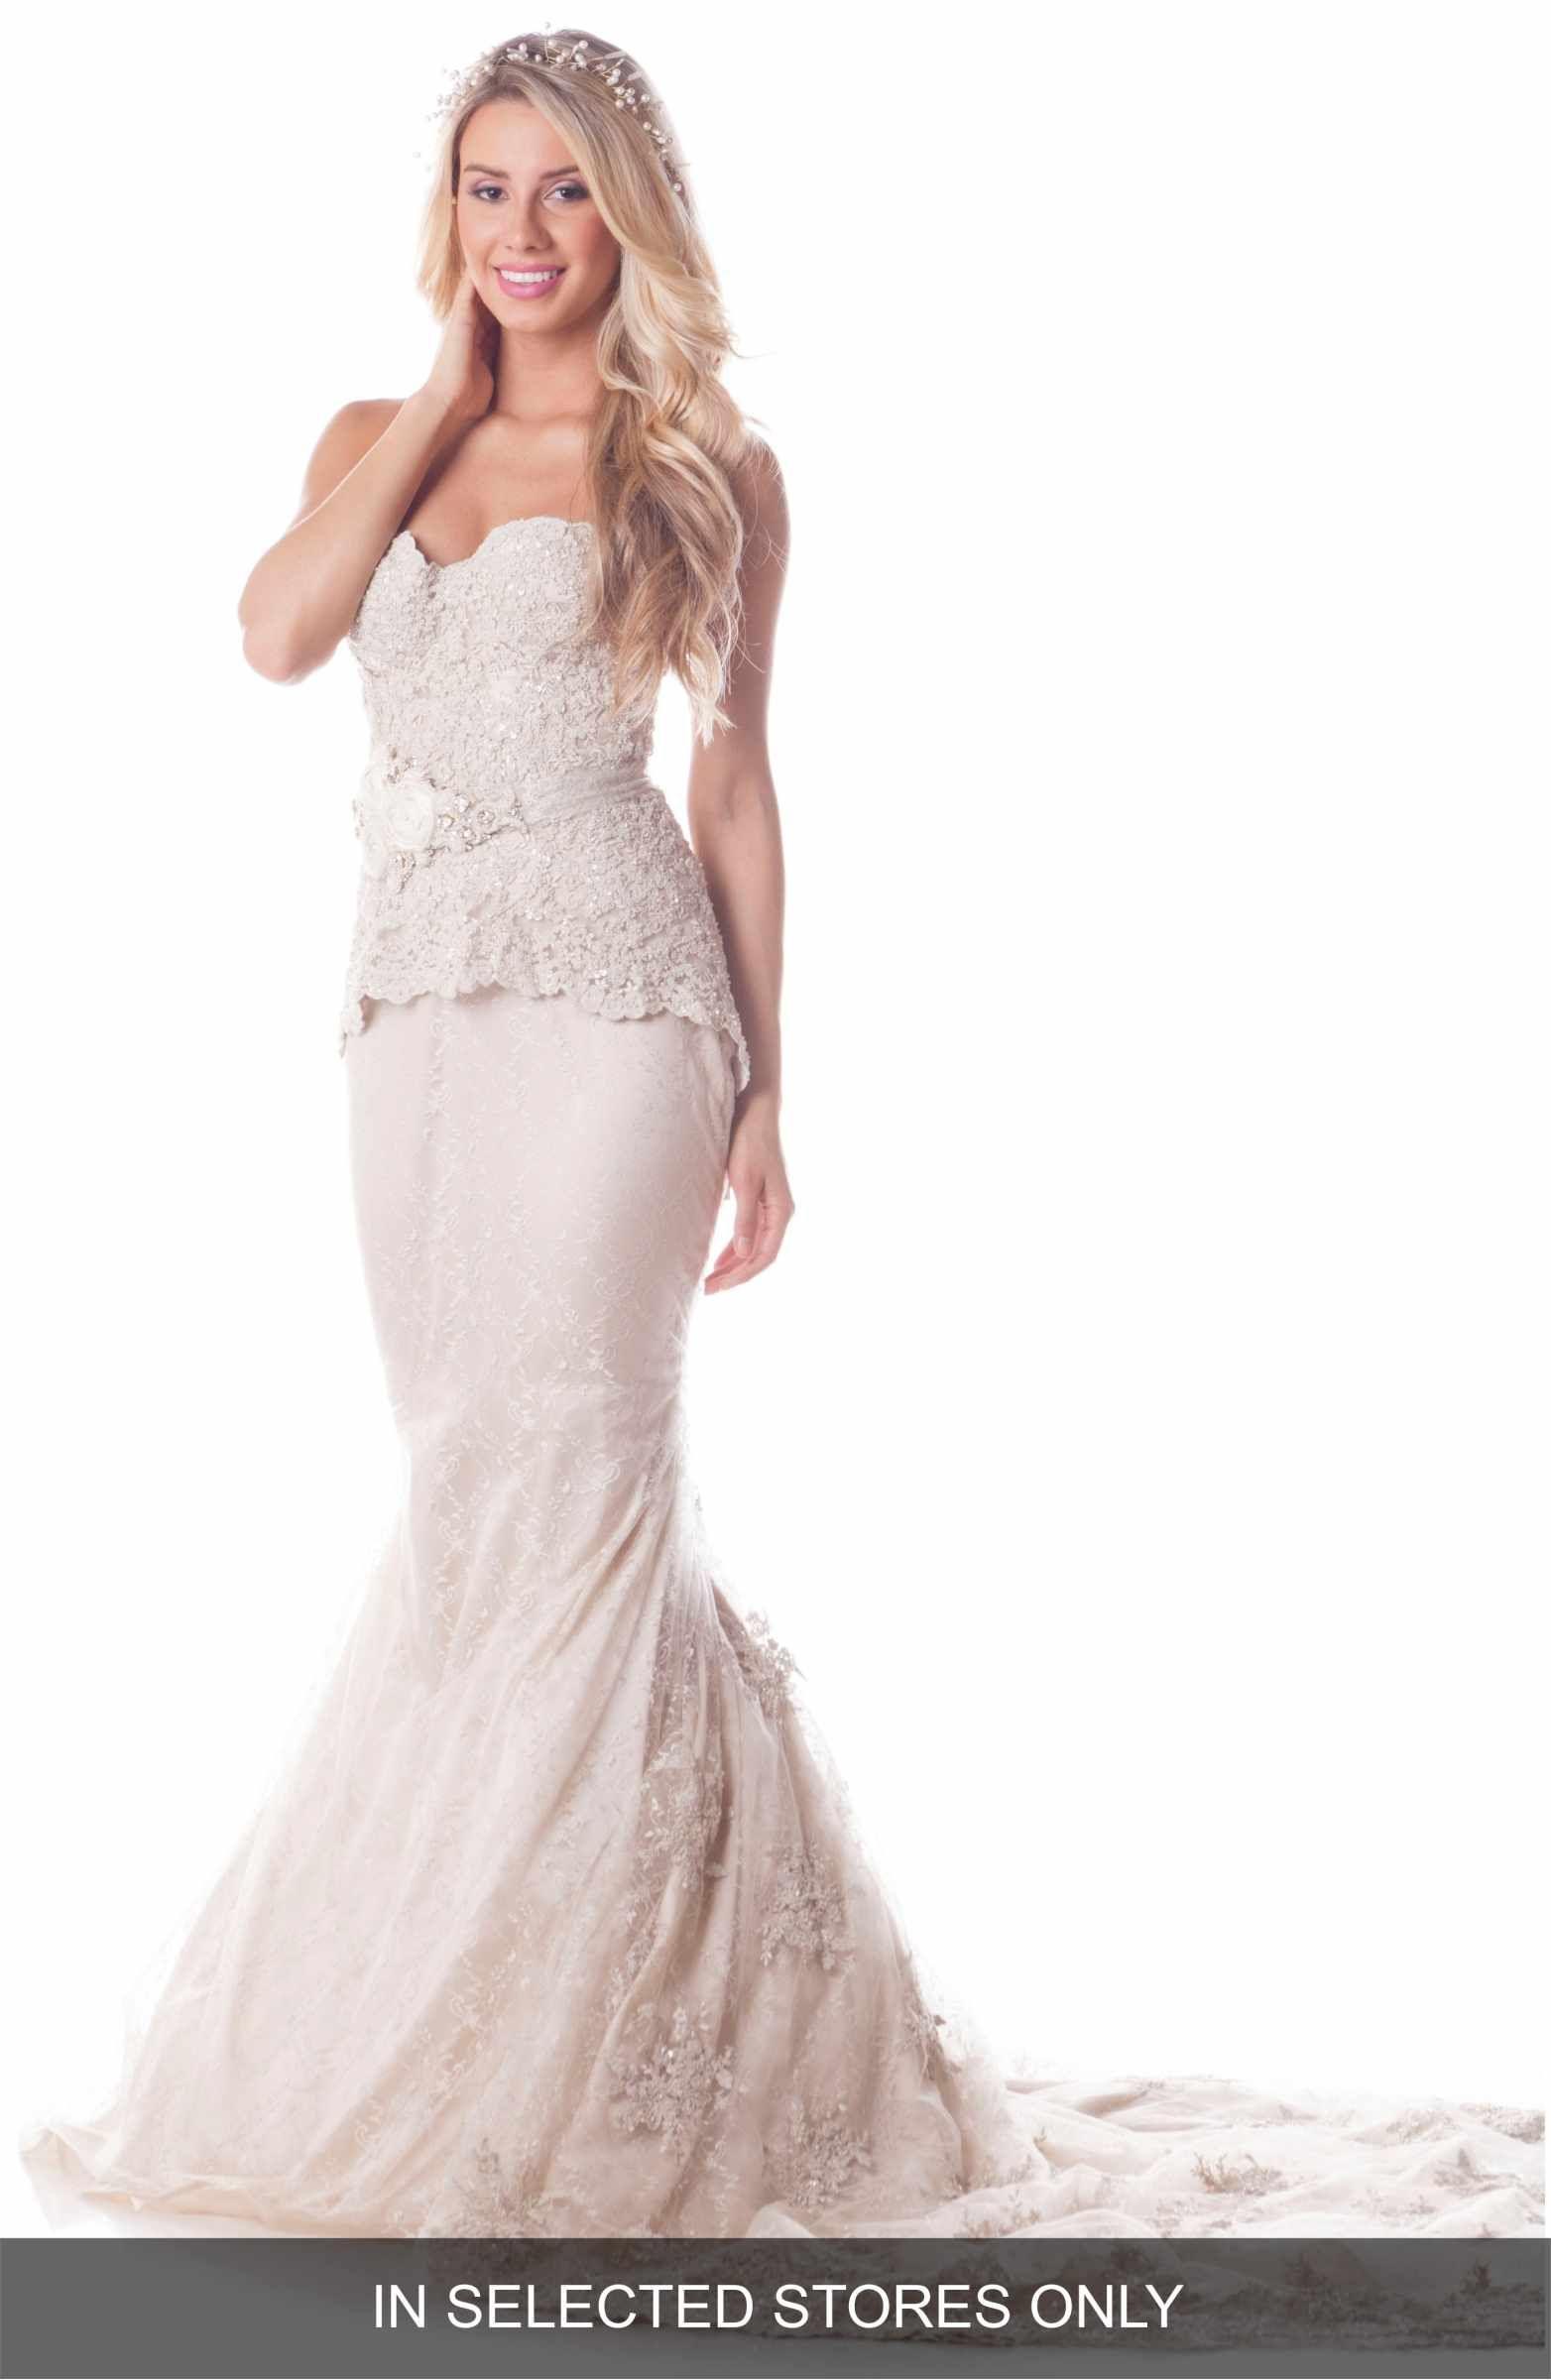 Silk sheath wedding dress  Main Image  Olia Zavozina Leah Strapless Embroidered Lace Silk Gown